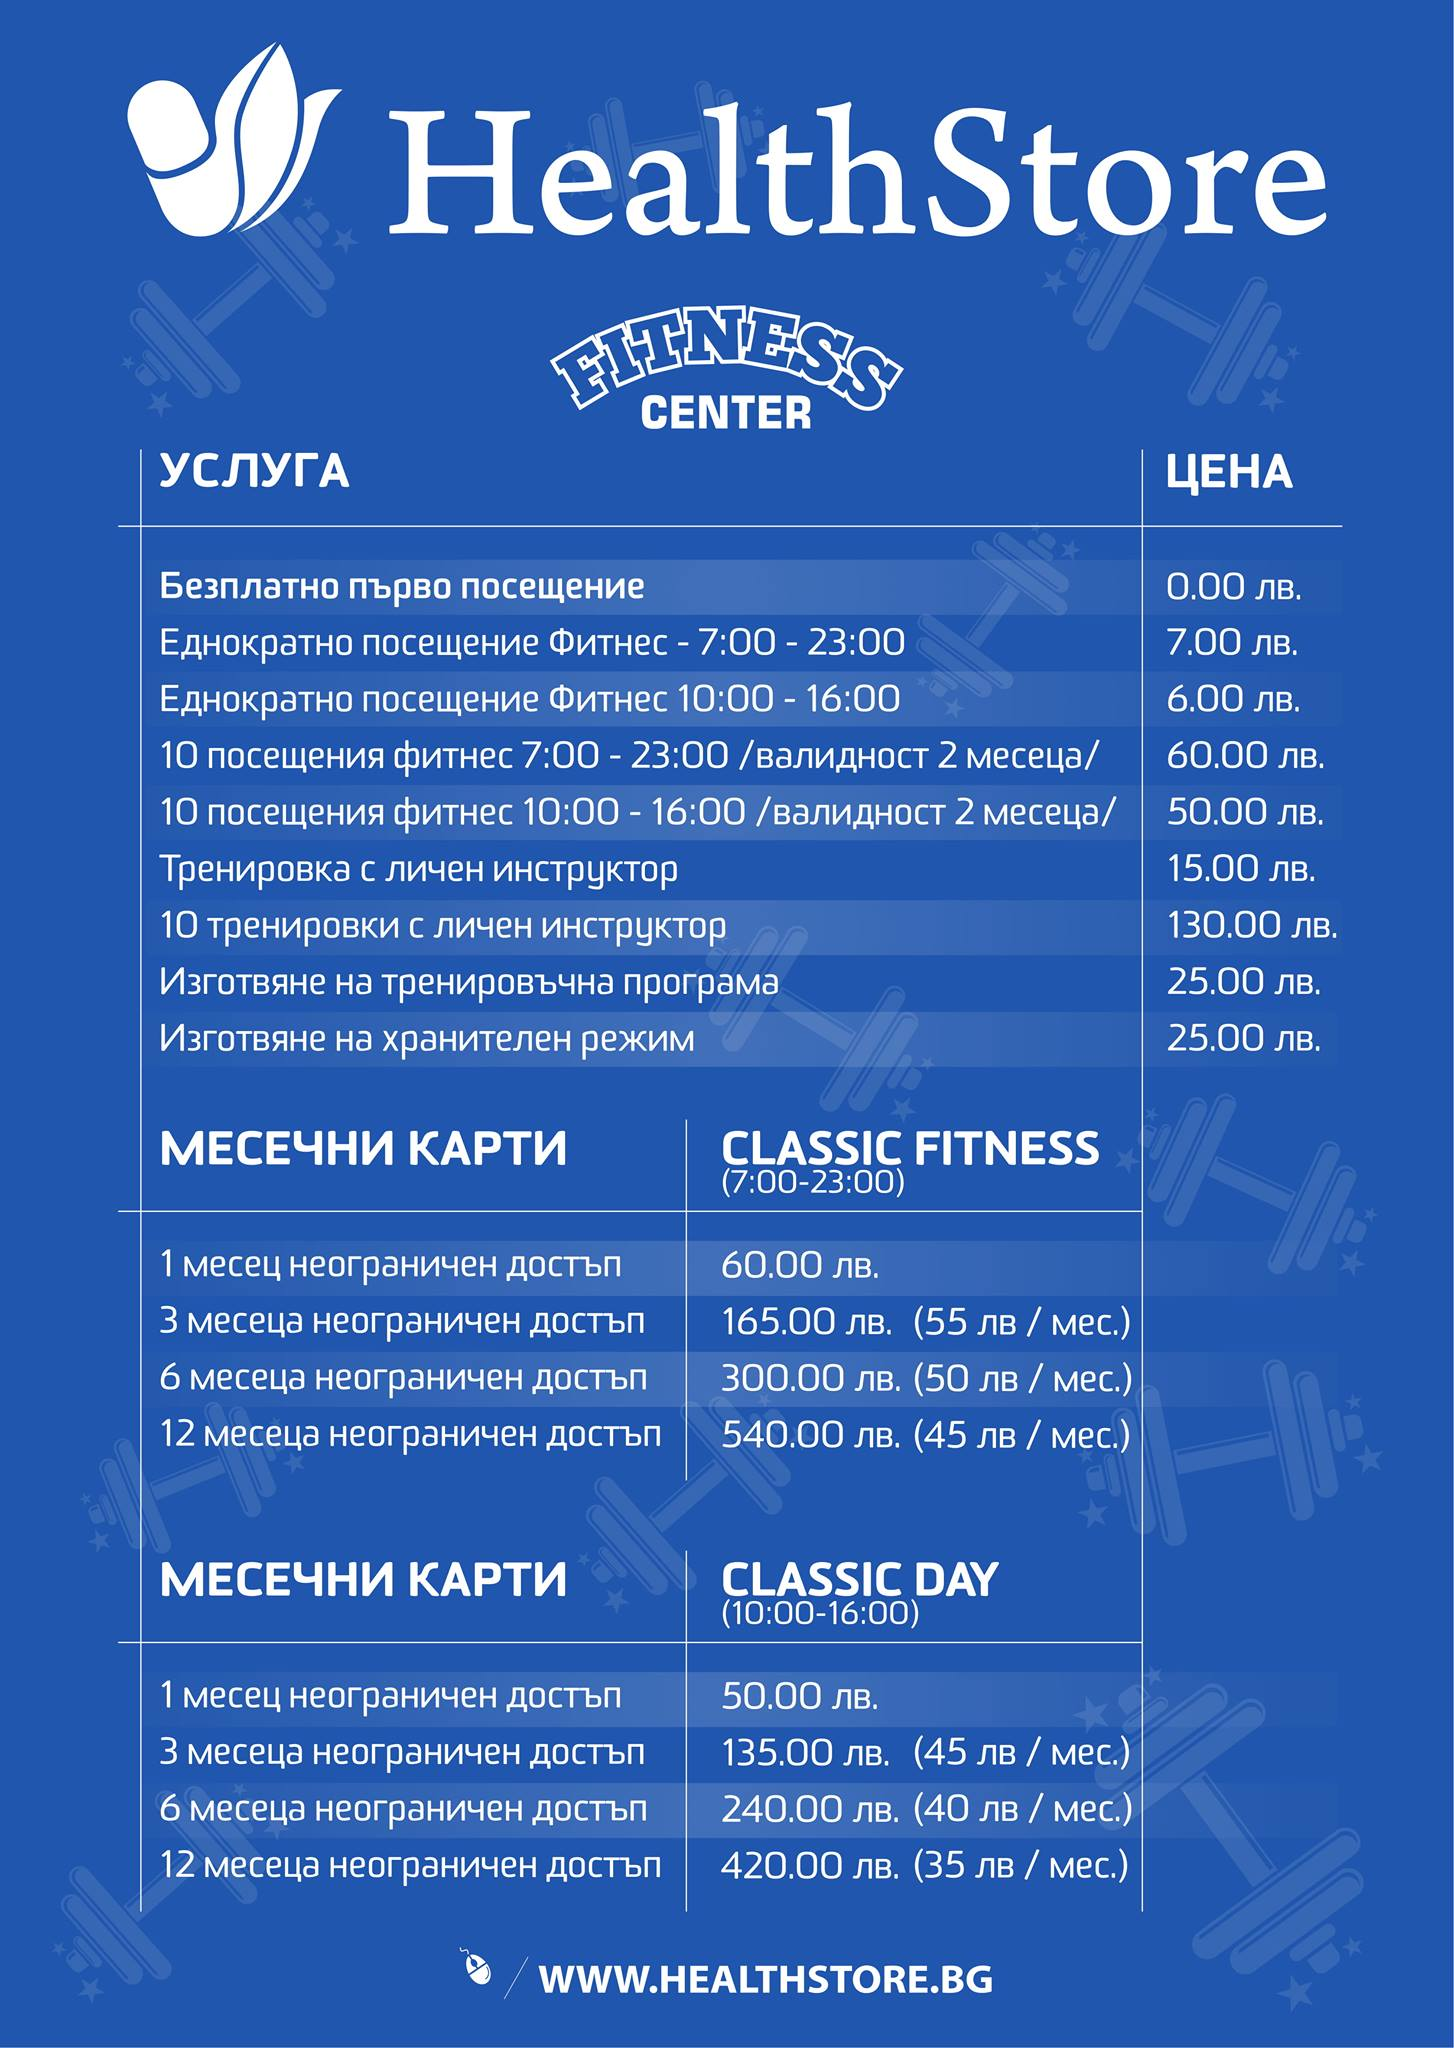 Най-луксозната фитнес зала в Бургас отваря врати! [2]